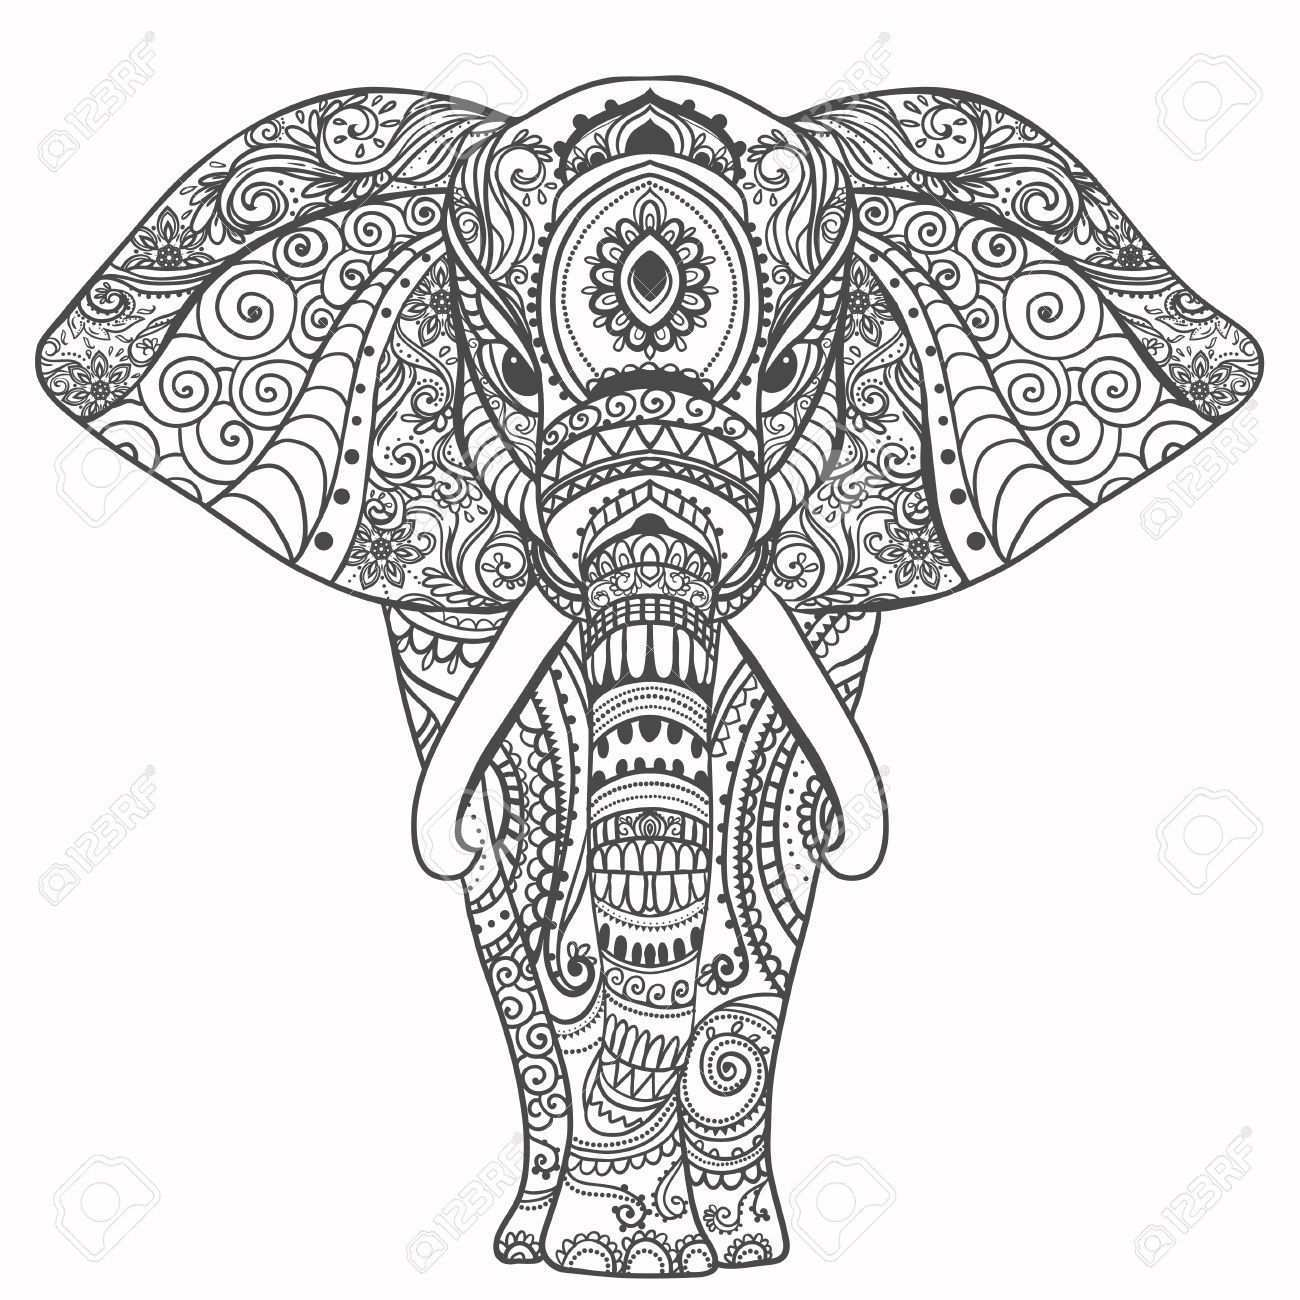 Gruss Schone Karte Mit Elefant Frame Of Animal Gemacht In Vektor Perfekte Mandala Tiere Kunstproduktion Elefant